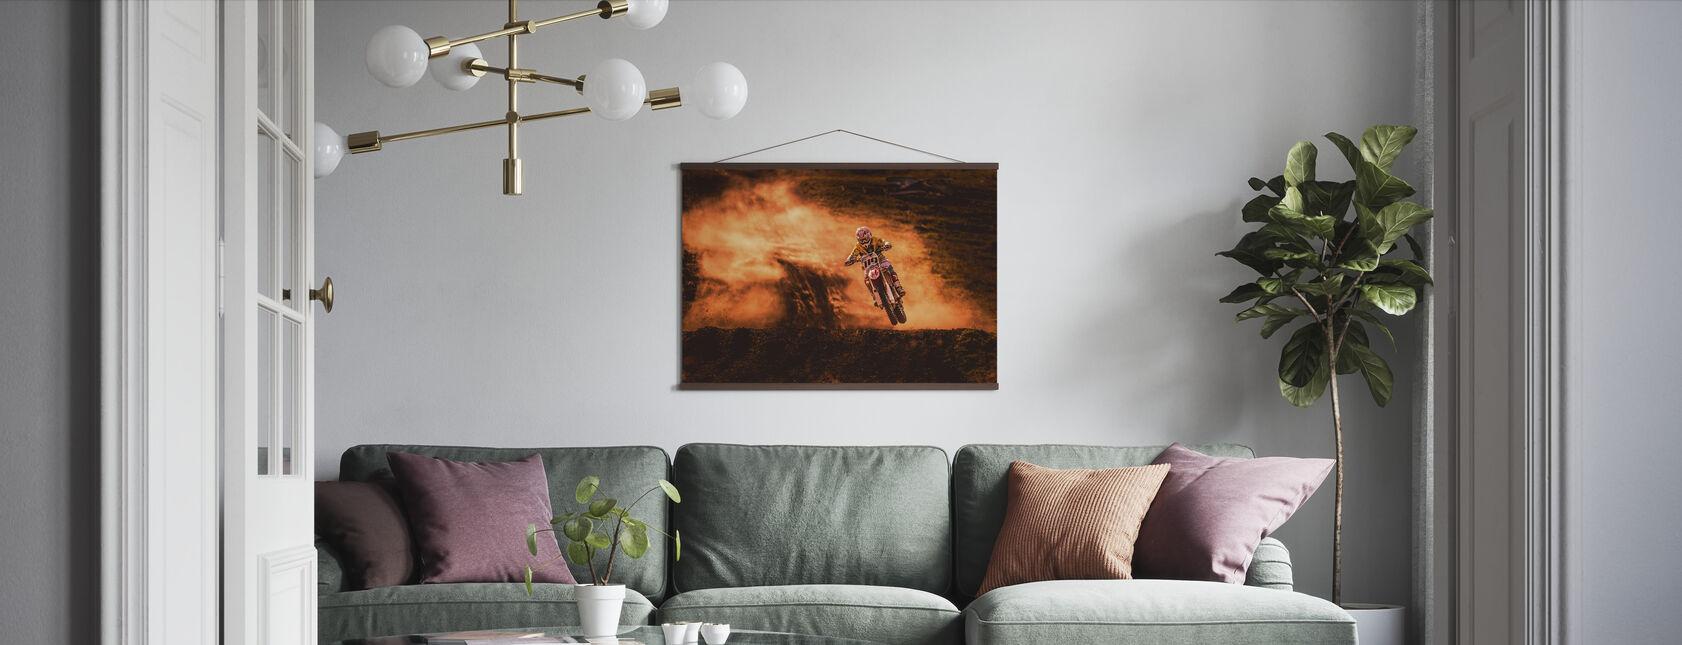 Boven - Poster - Woonkamer